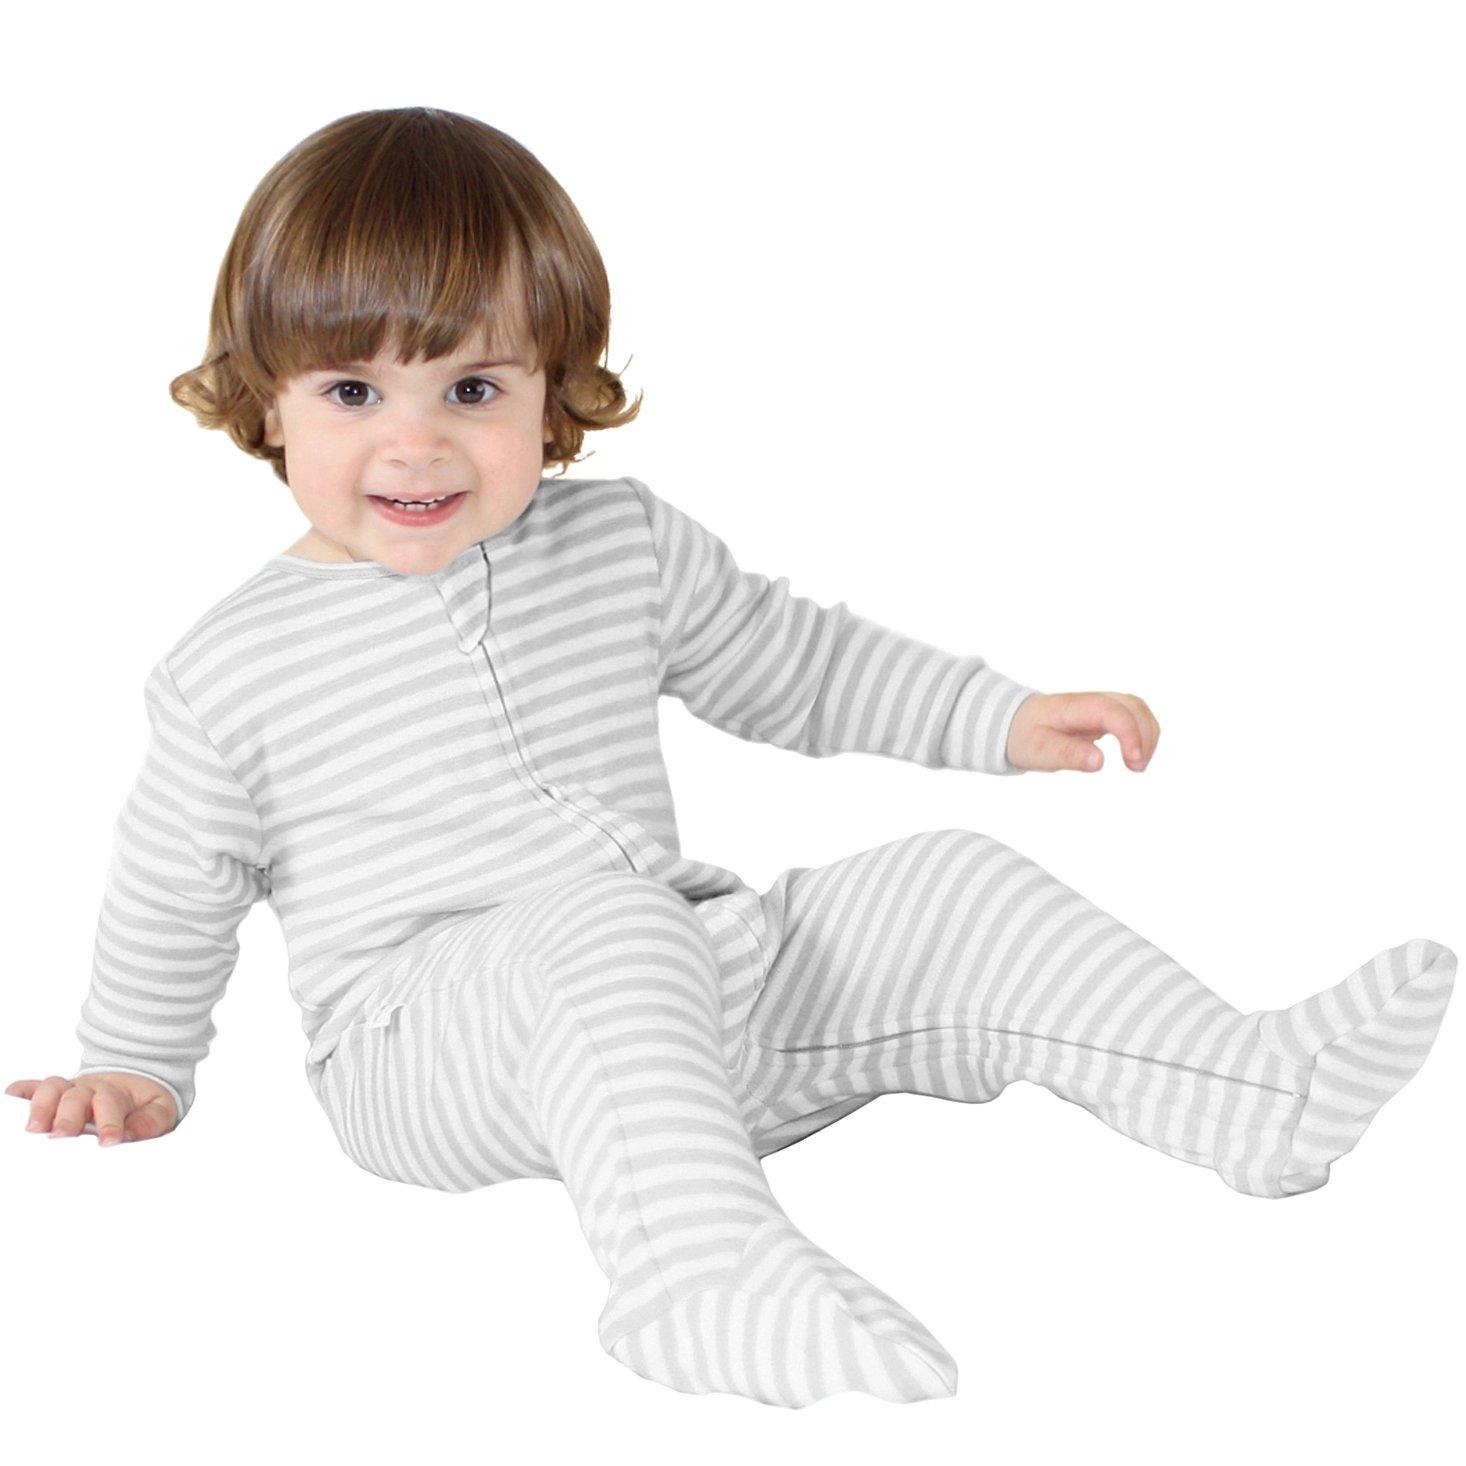 Woolino Footie Sleeper, 100% Superfine Merino Wool Sleeper, 3-6 Months, Gray